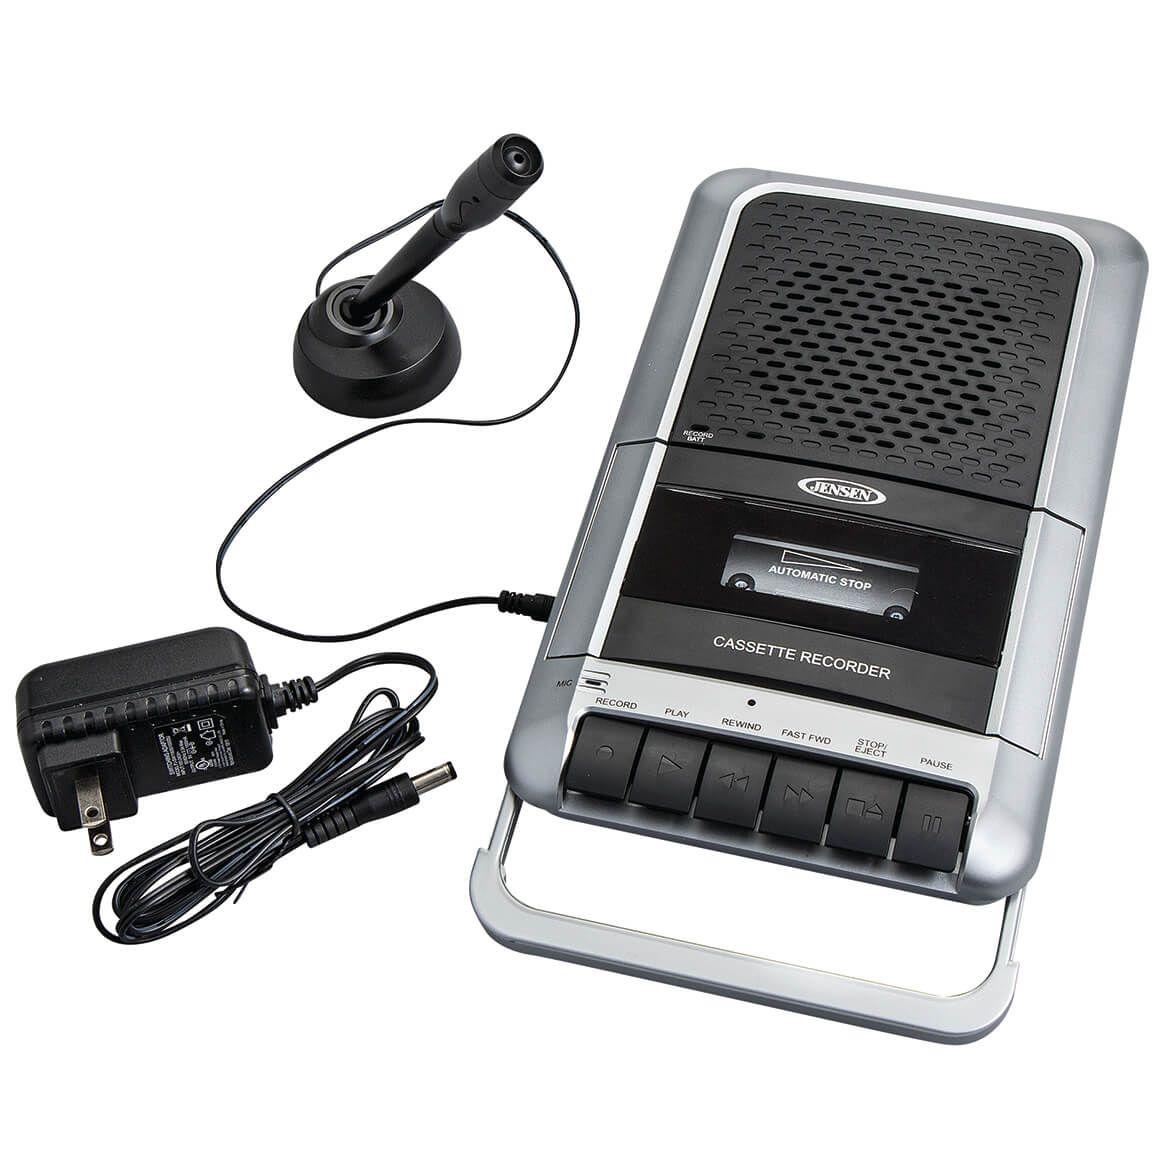 Jensen® Portable Cassette Player & Recorder-368886